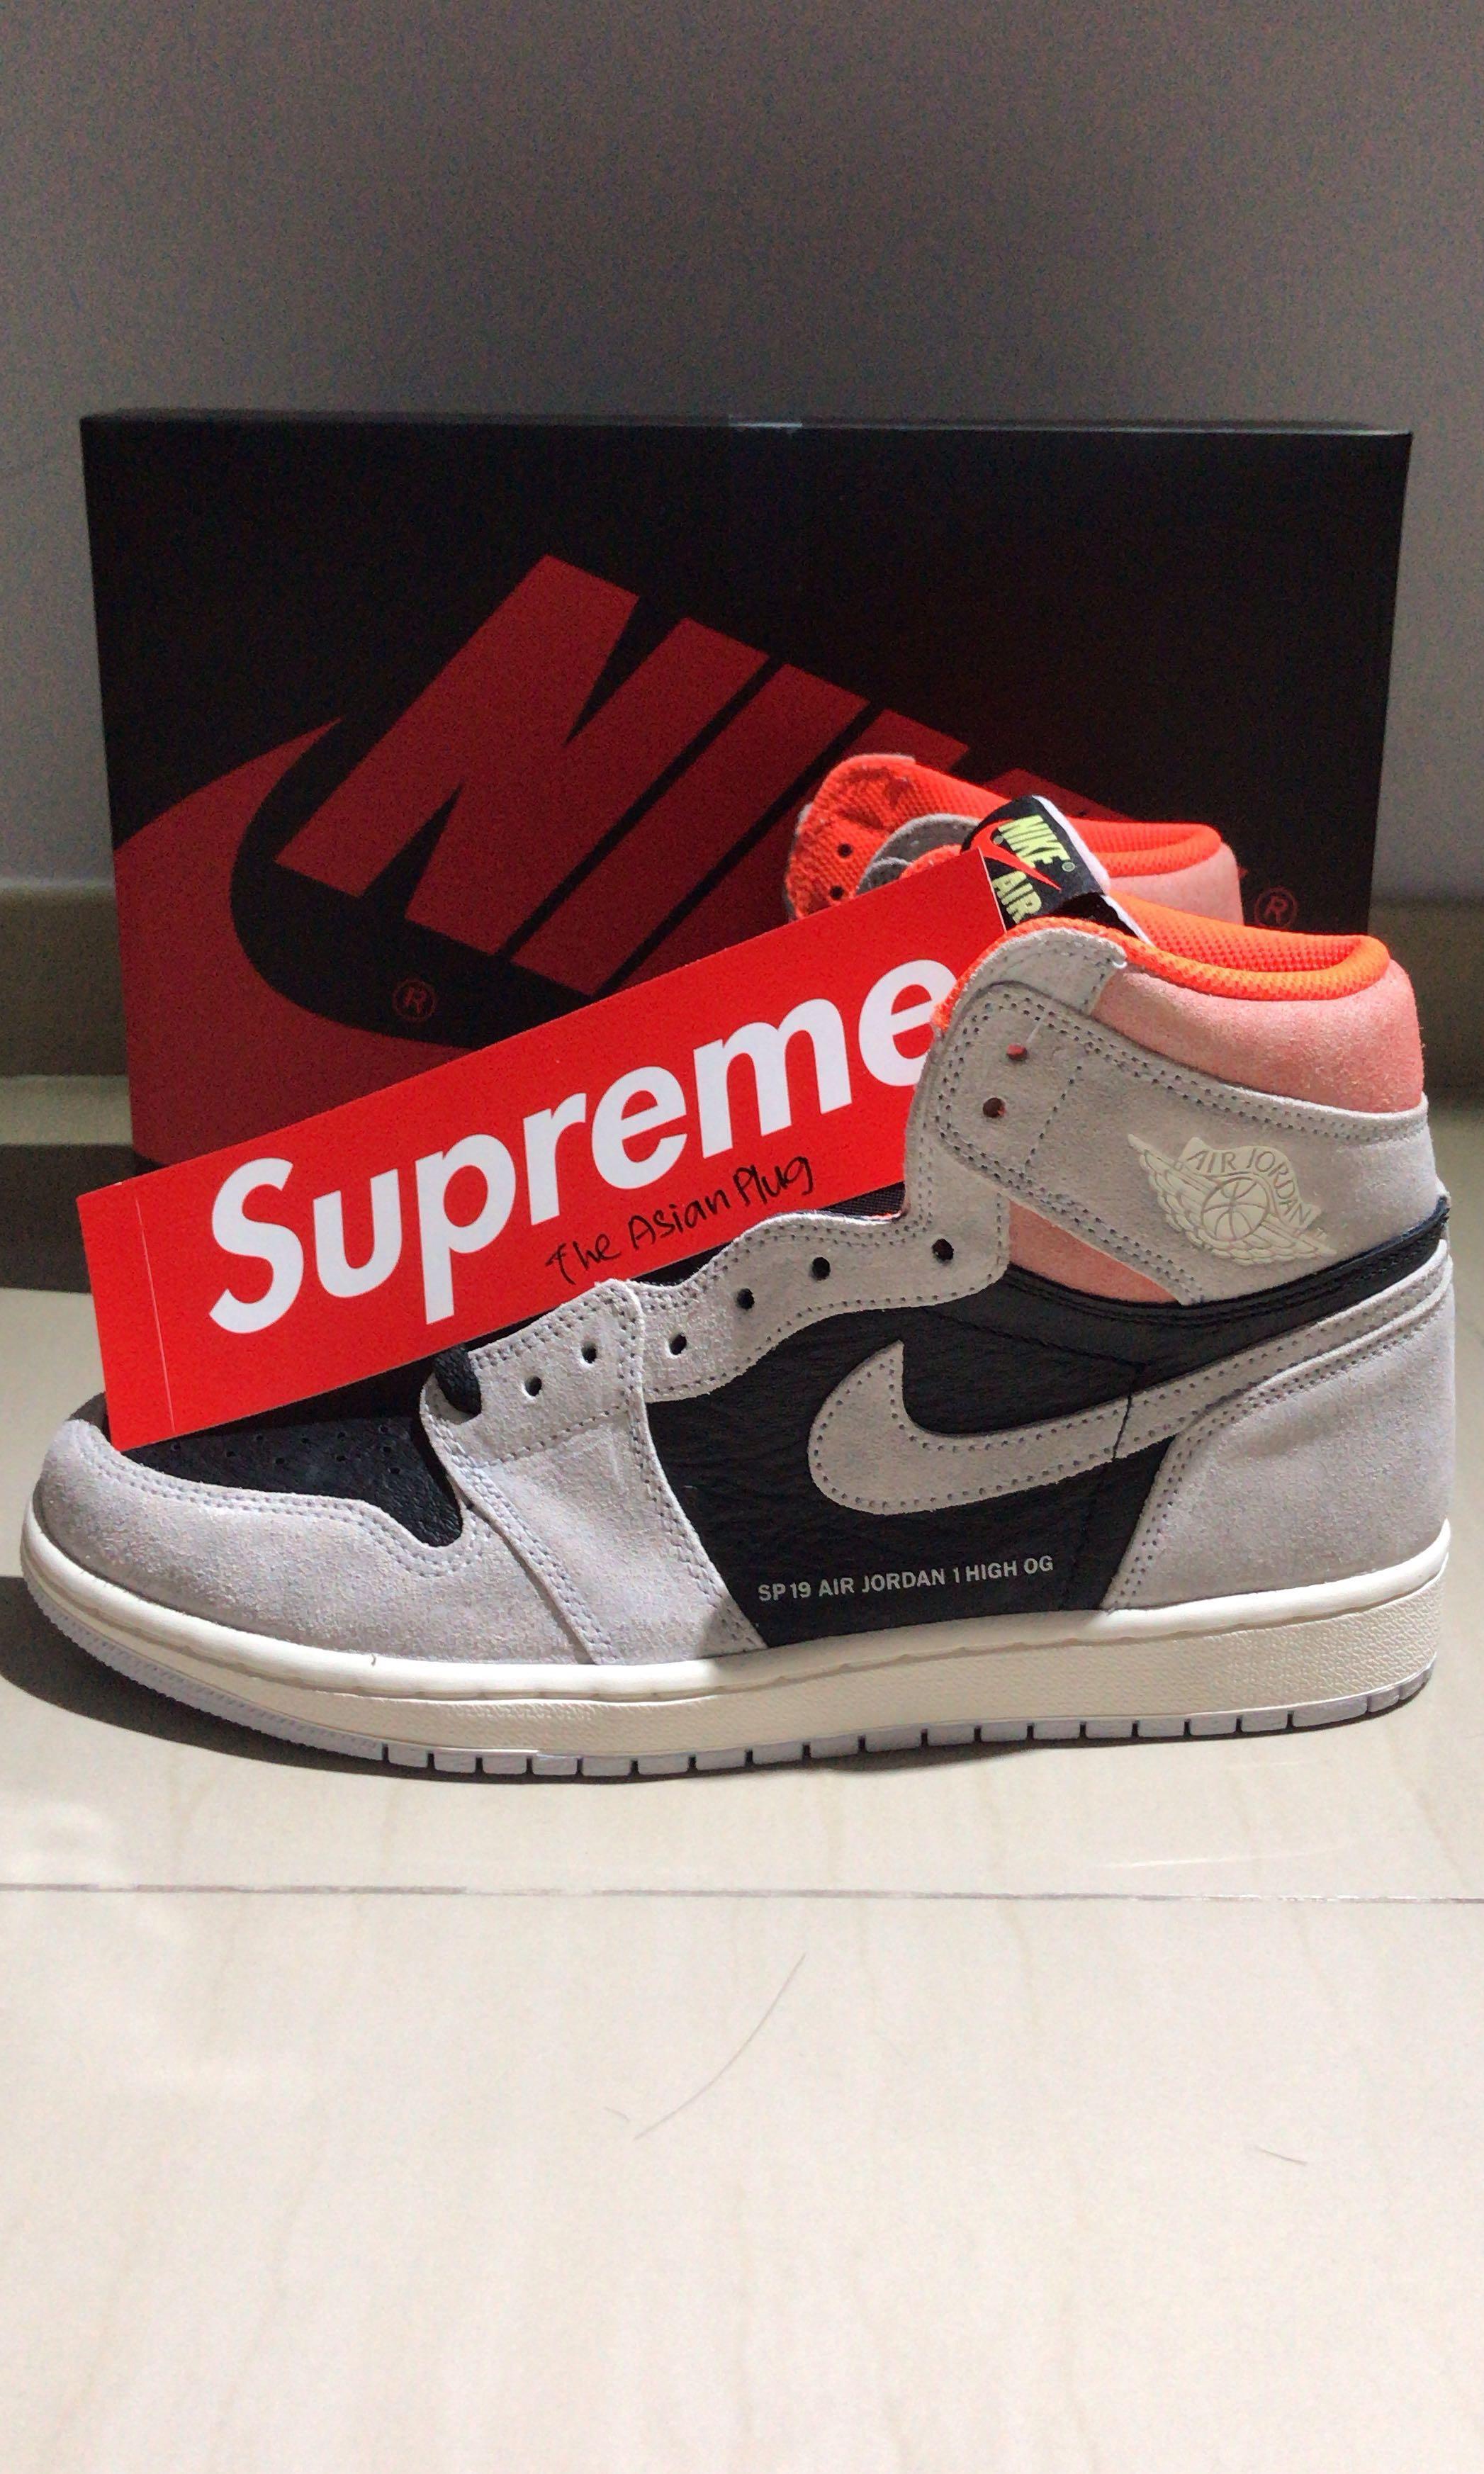 5e32a3d70c0dc0 Nike Jordan 1 Neutral Grey Hyper Crimson